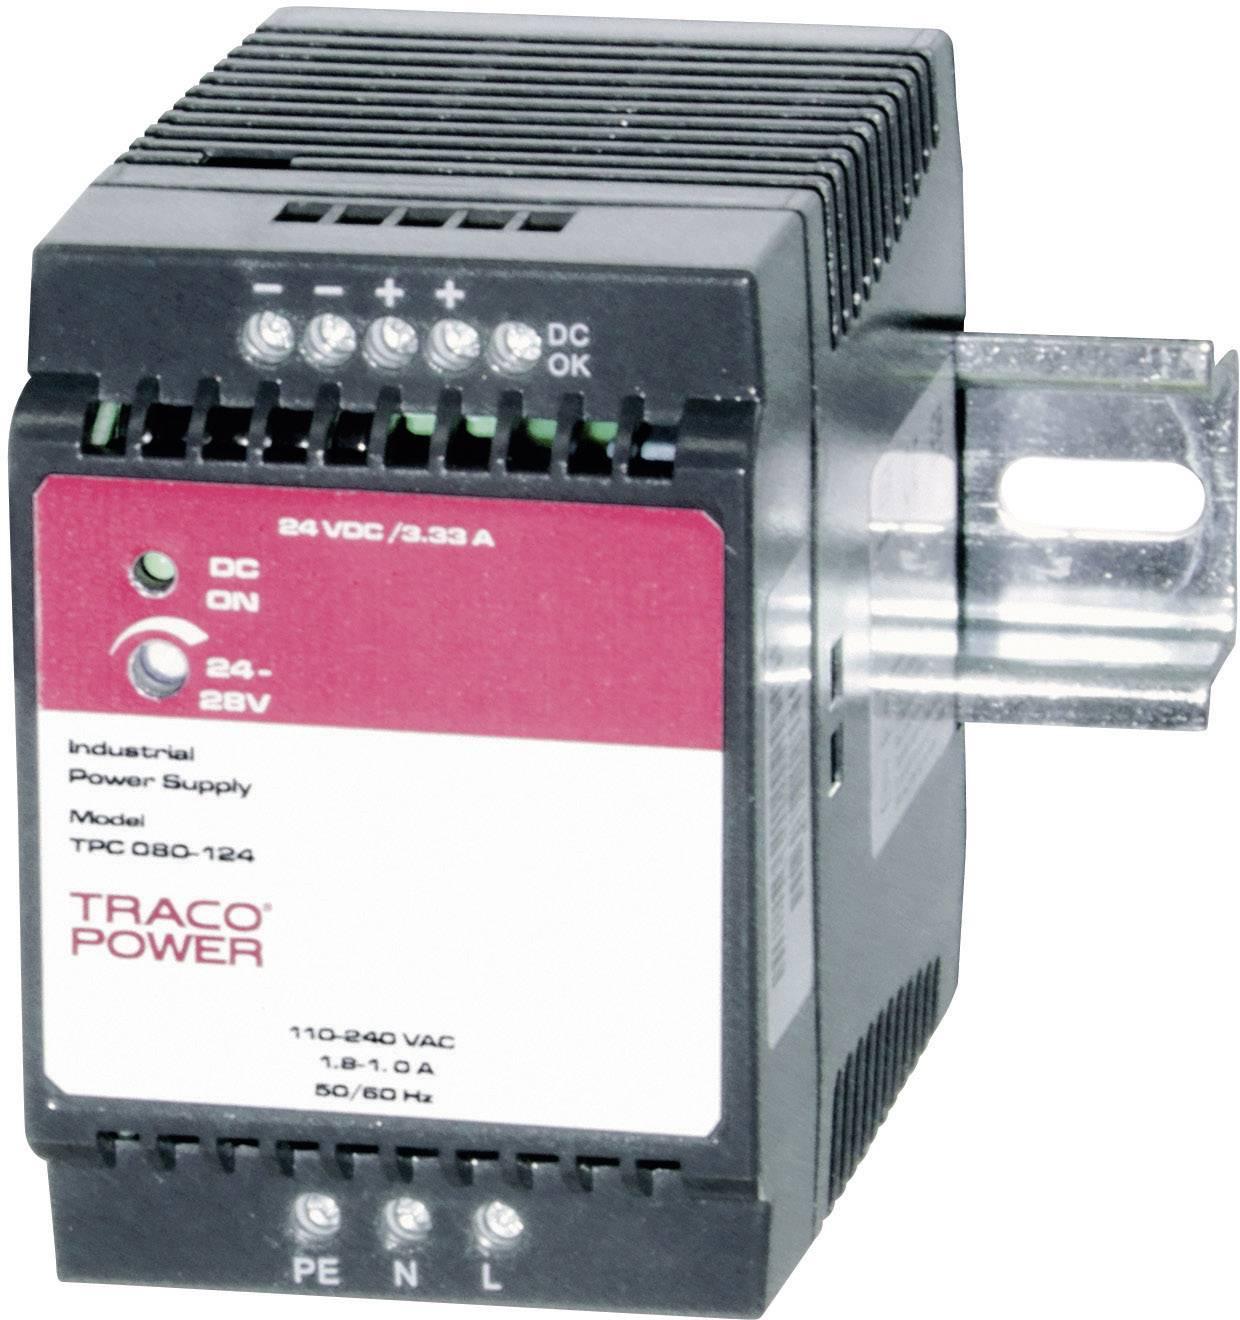 Zdroj na DIN lištu TracoPower TPC 080-124, 24 - 28,8 V/DC, 3,3 A